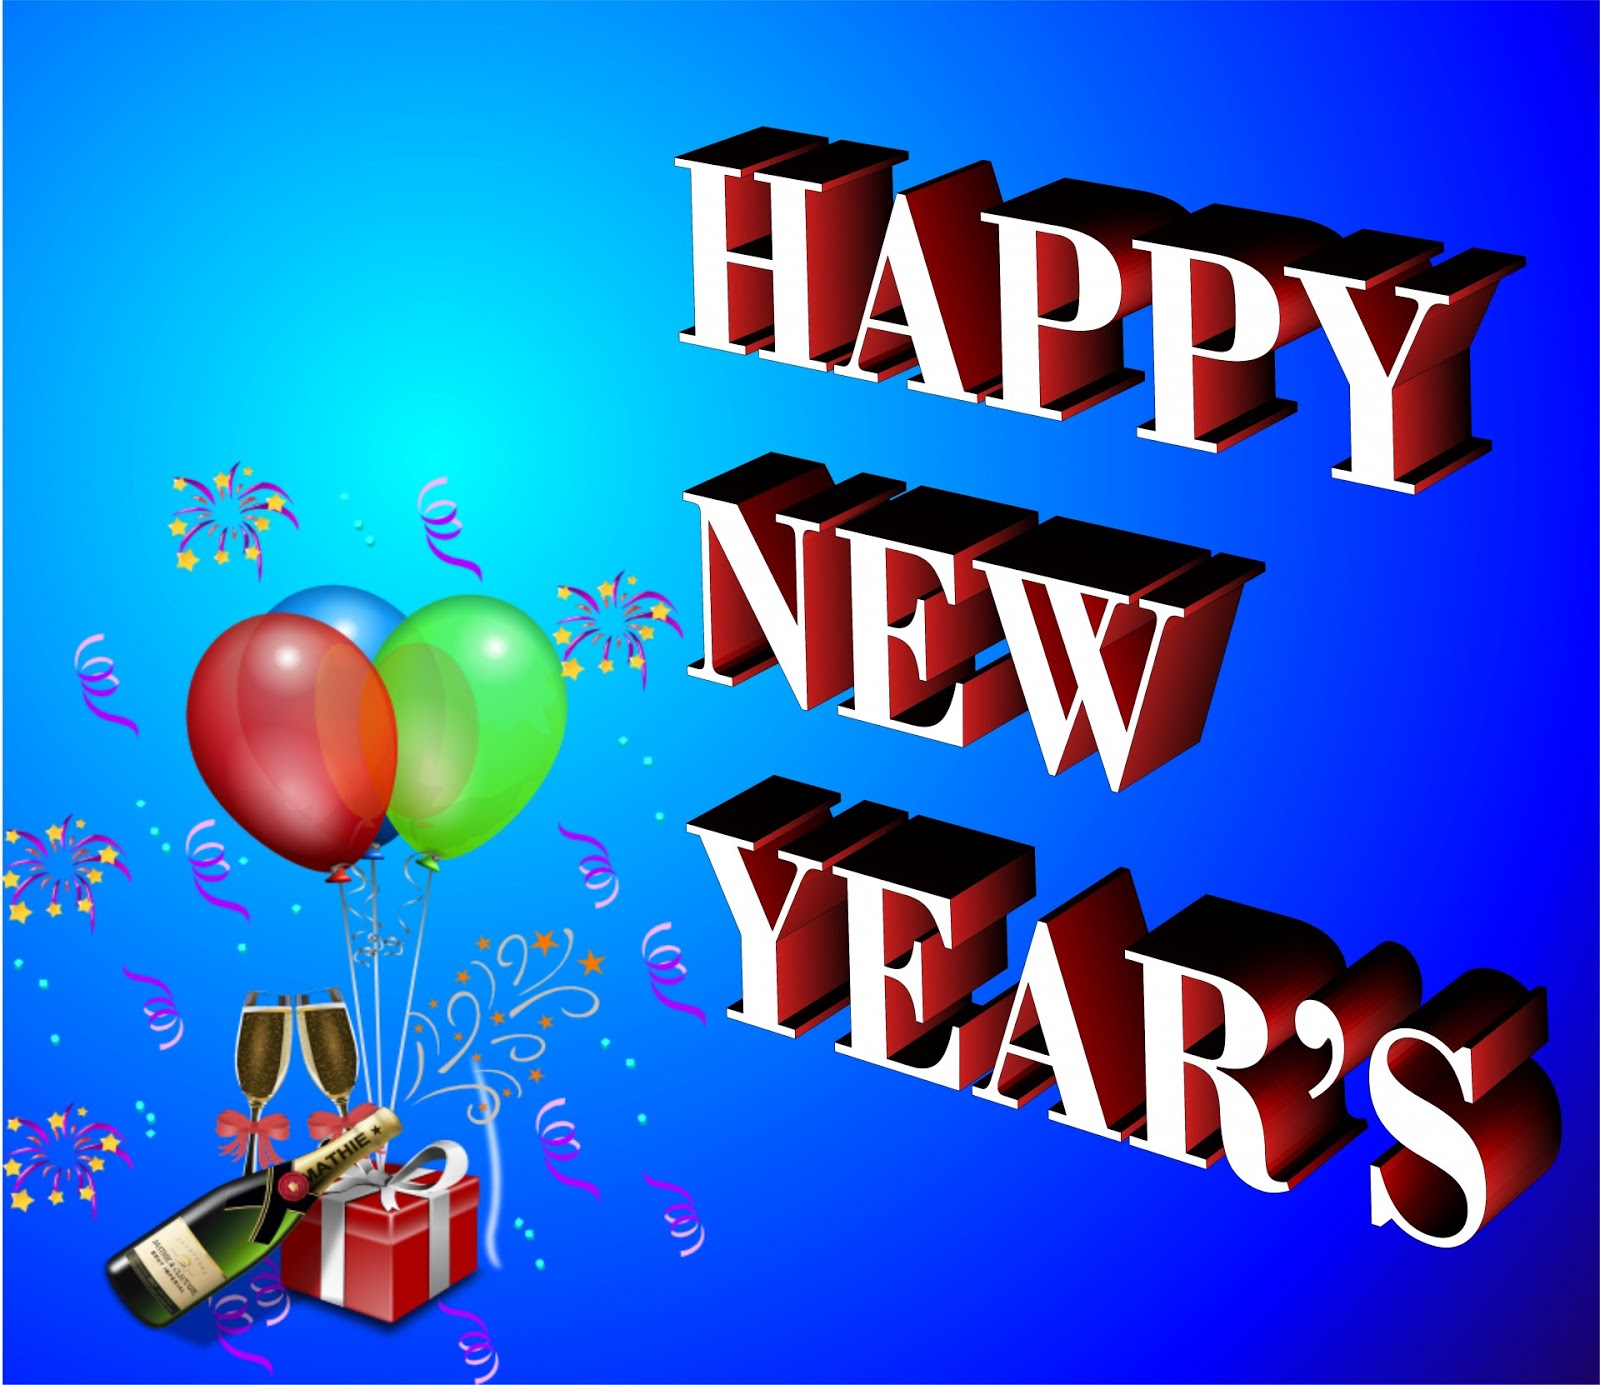 Happy New Year Shayari Hindi Love Top 15 New Year Best Shayari Mad Best Shayari